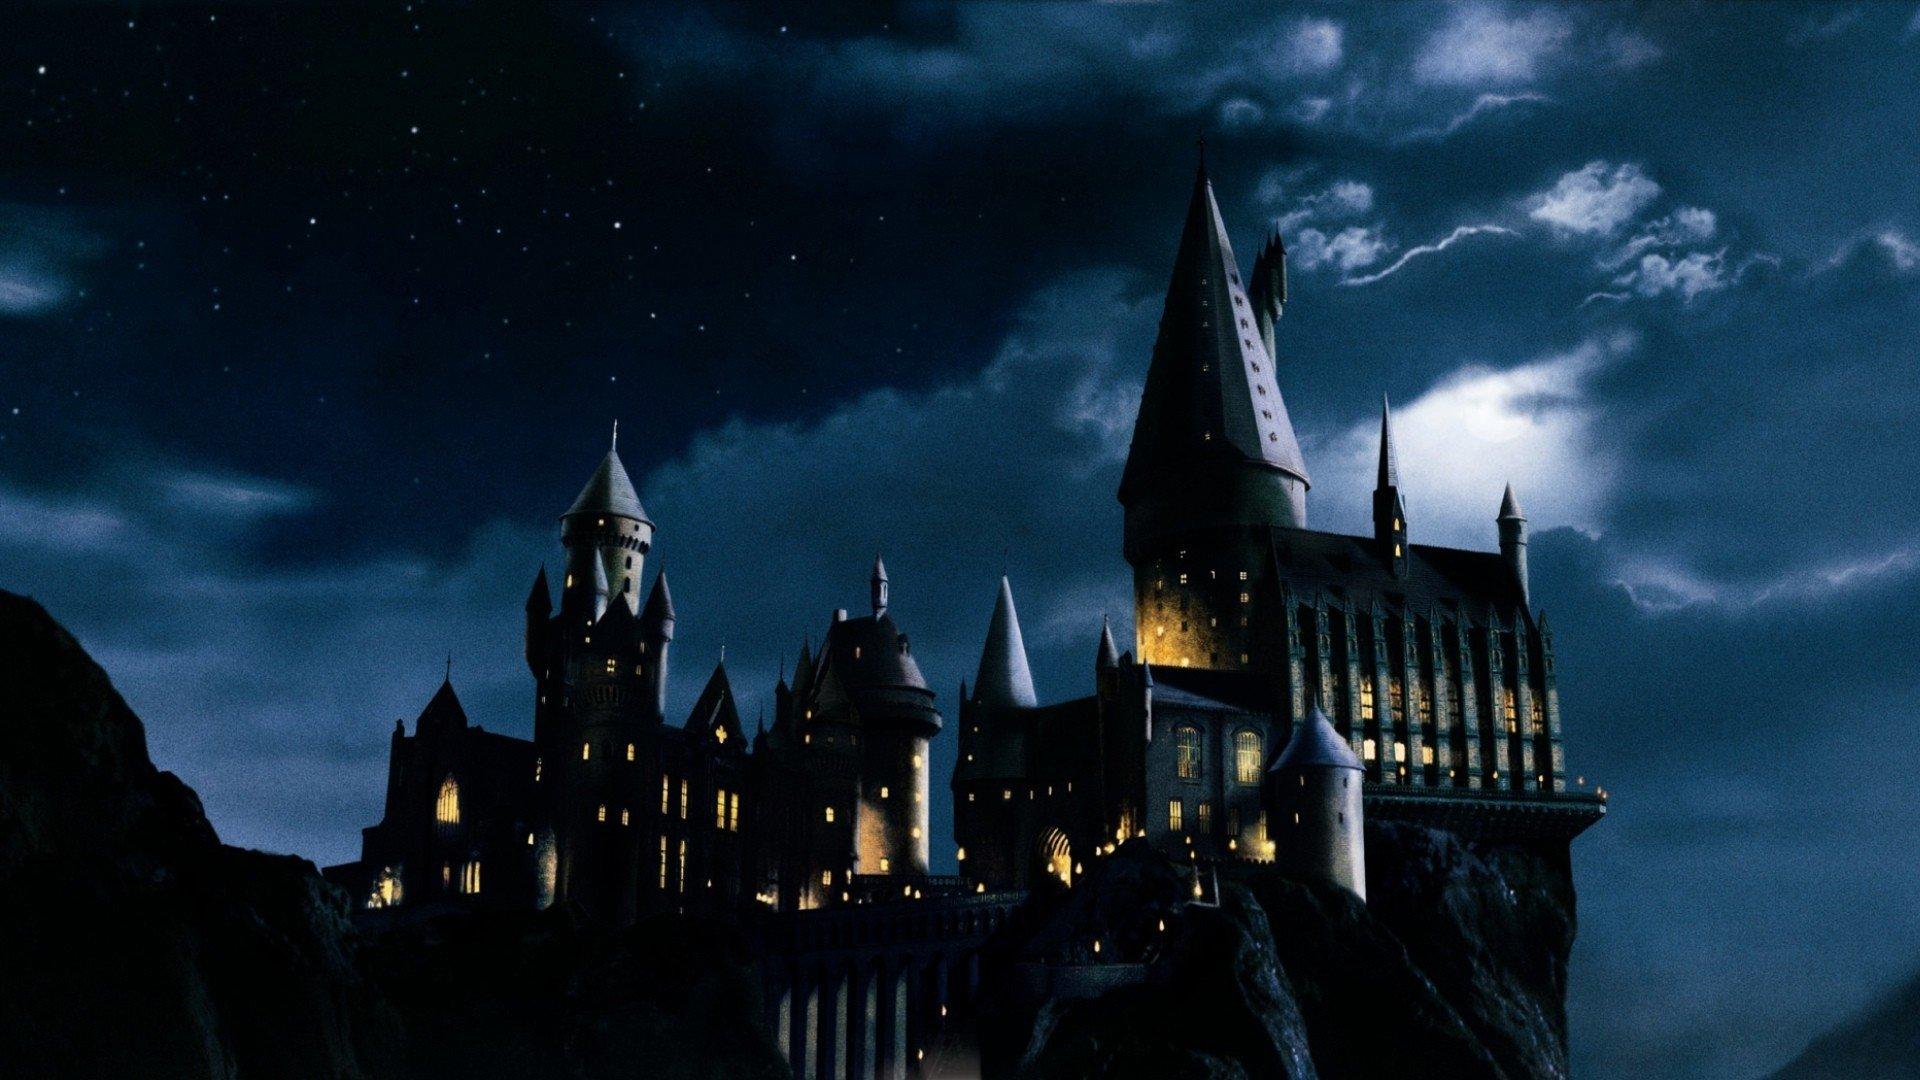 46 Hogwarts Wallpaper Hd On Wallpapersafari